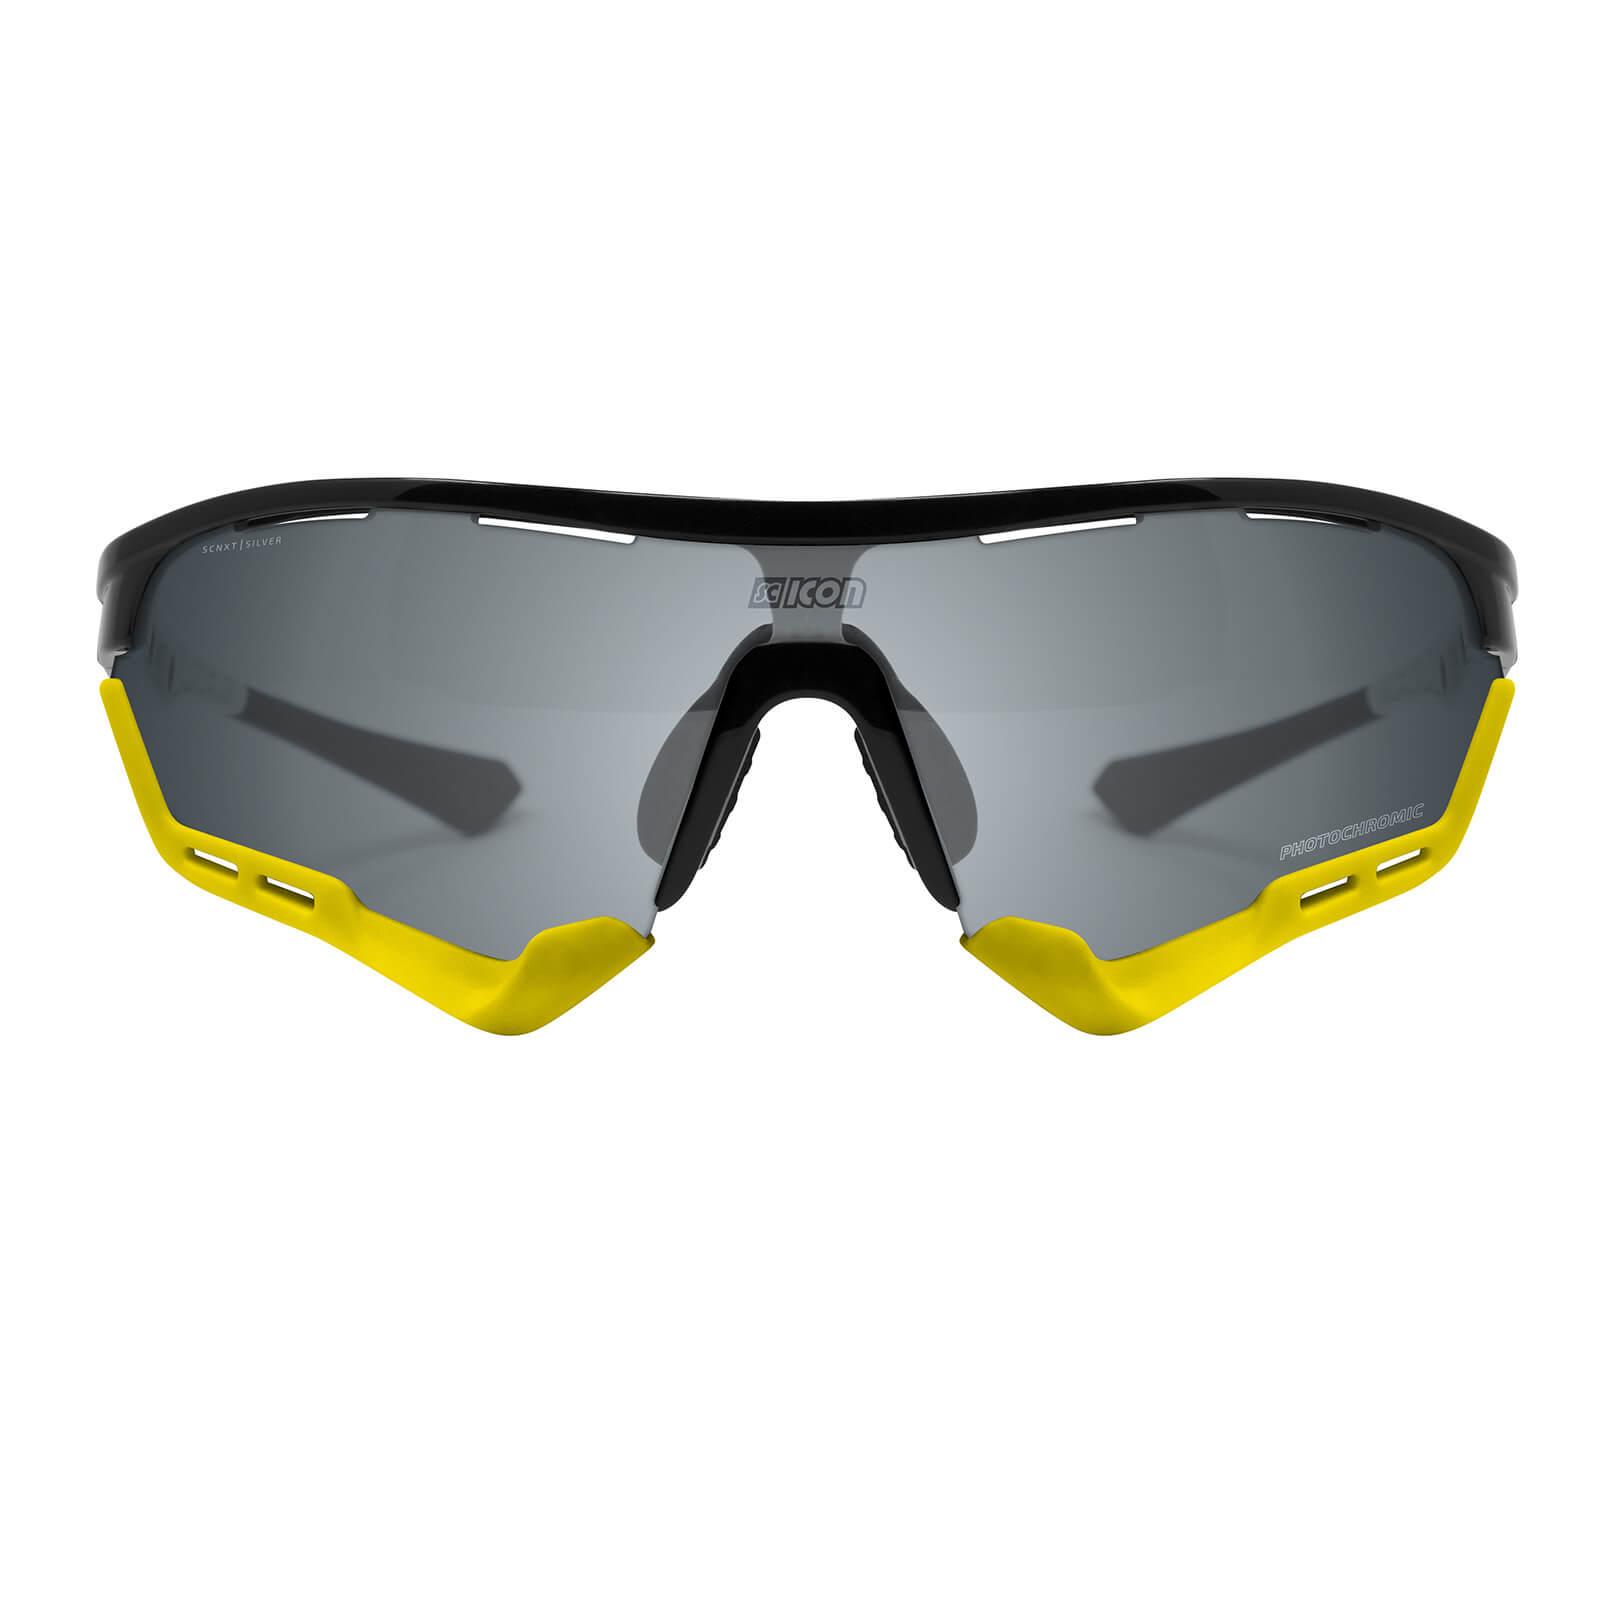 Scicon Aerotech Sunglasses SCN-XT Photochromic Silver Mirror Lens - Black Gloss Frame - Standard Lens